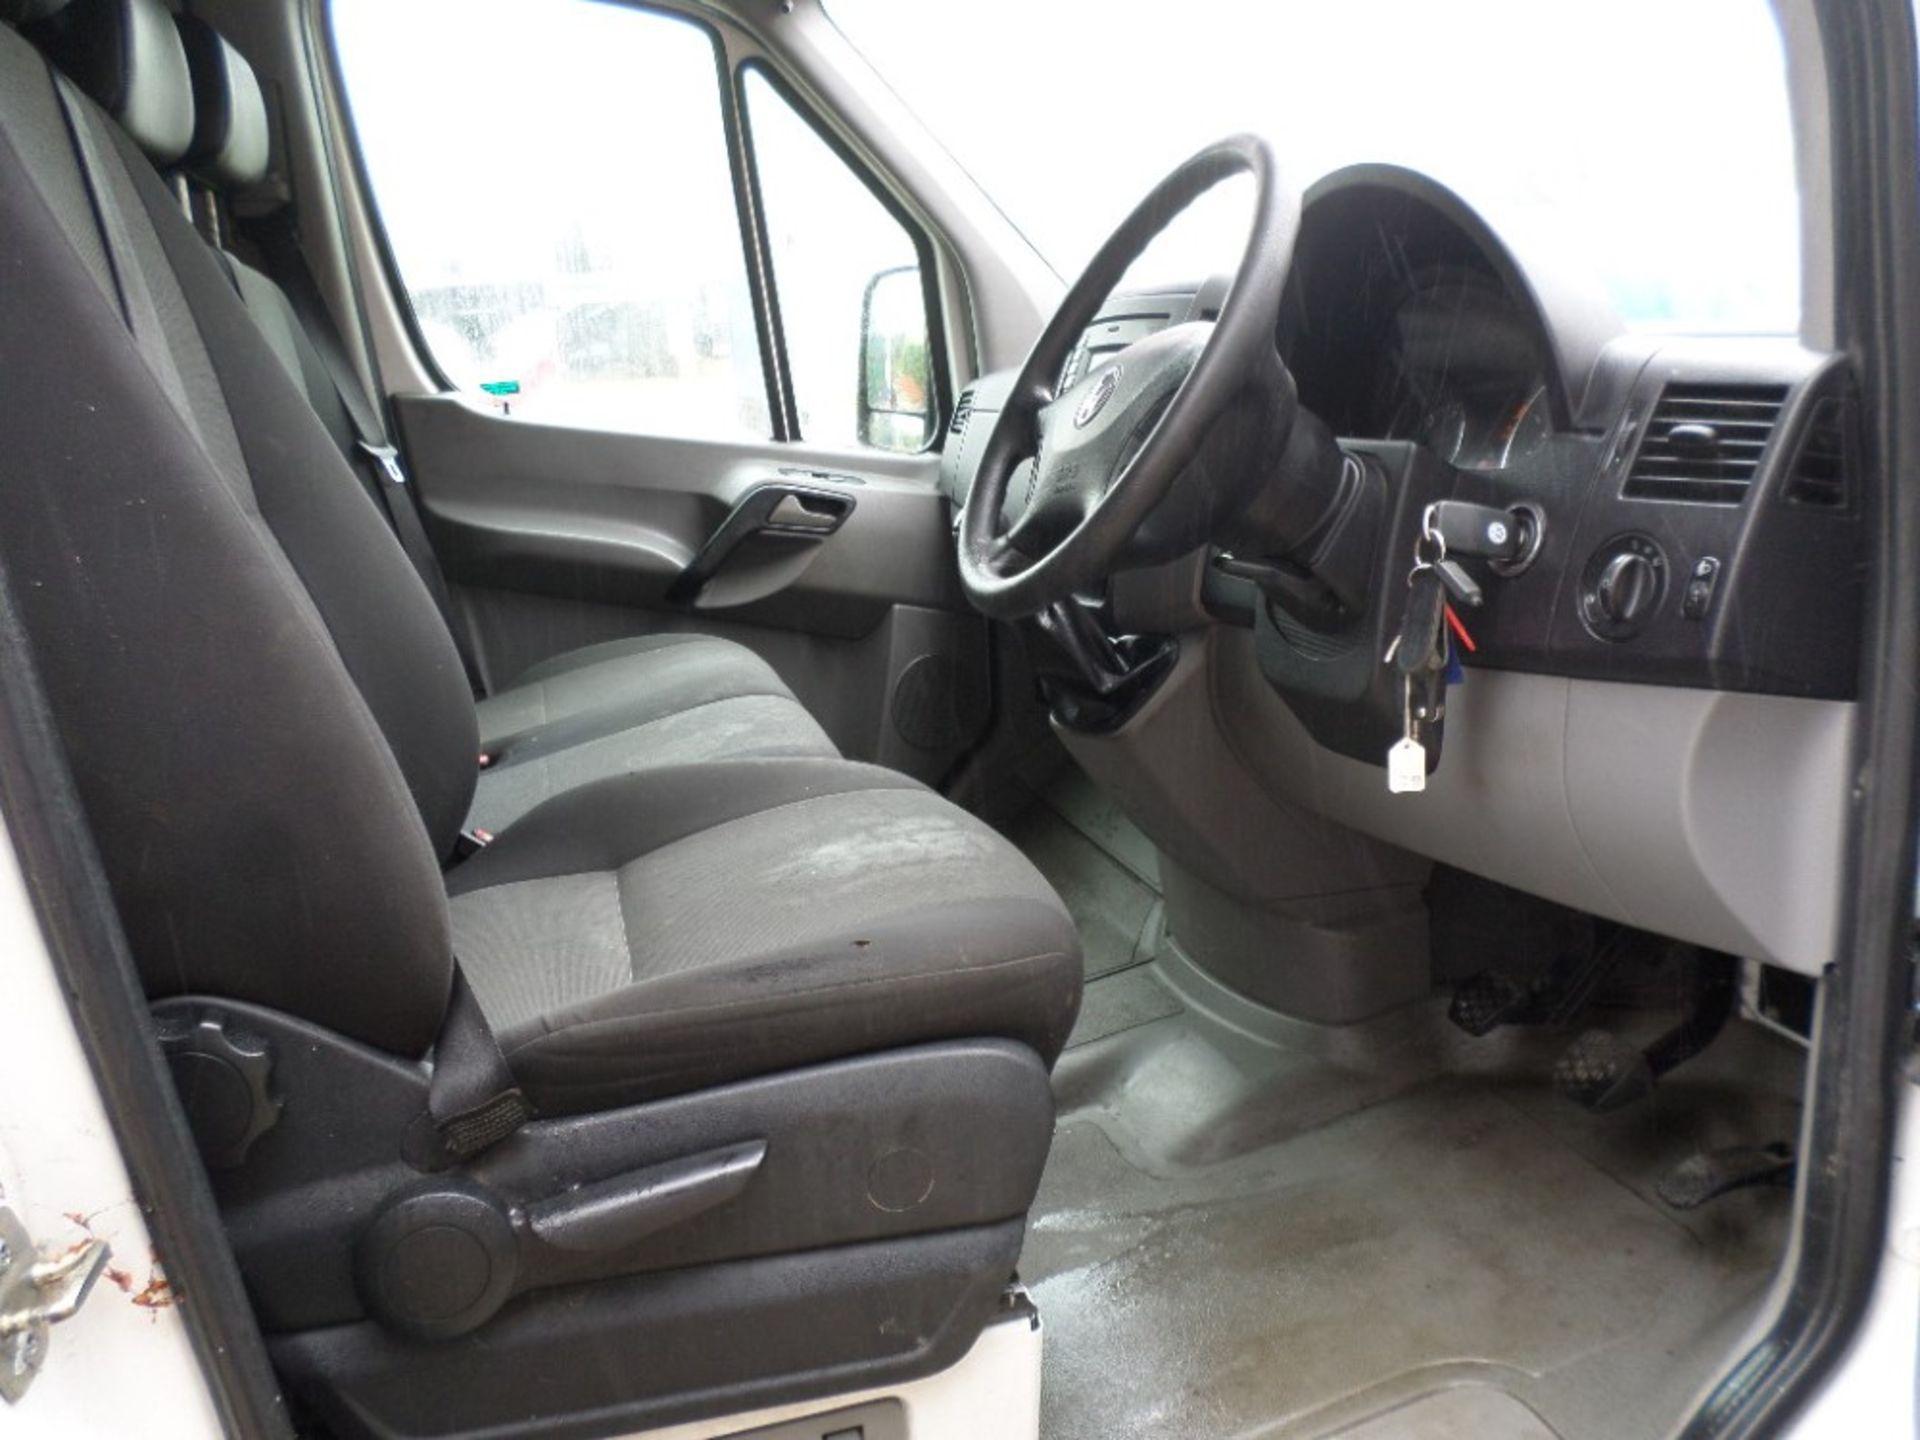 15 reg VW CRAFTER CR35 TDI LWB (LOCATION SHEFFIELD) 1ST REG 04/15, 106005M, V5 HERE [+ VAT] - Image 6 of 6